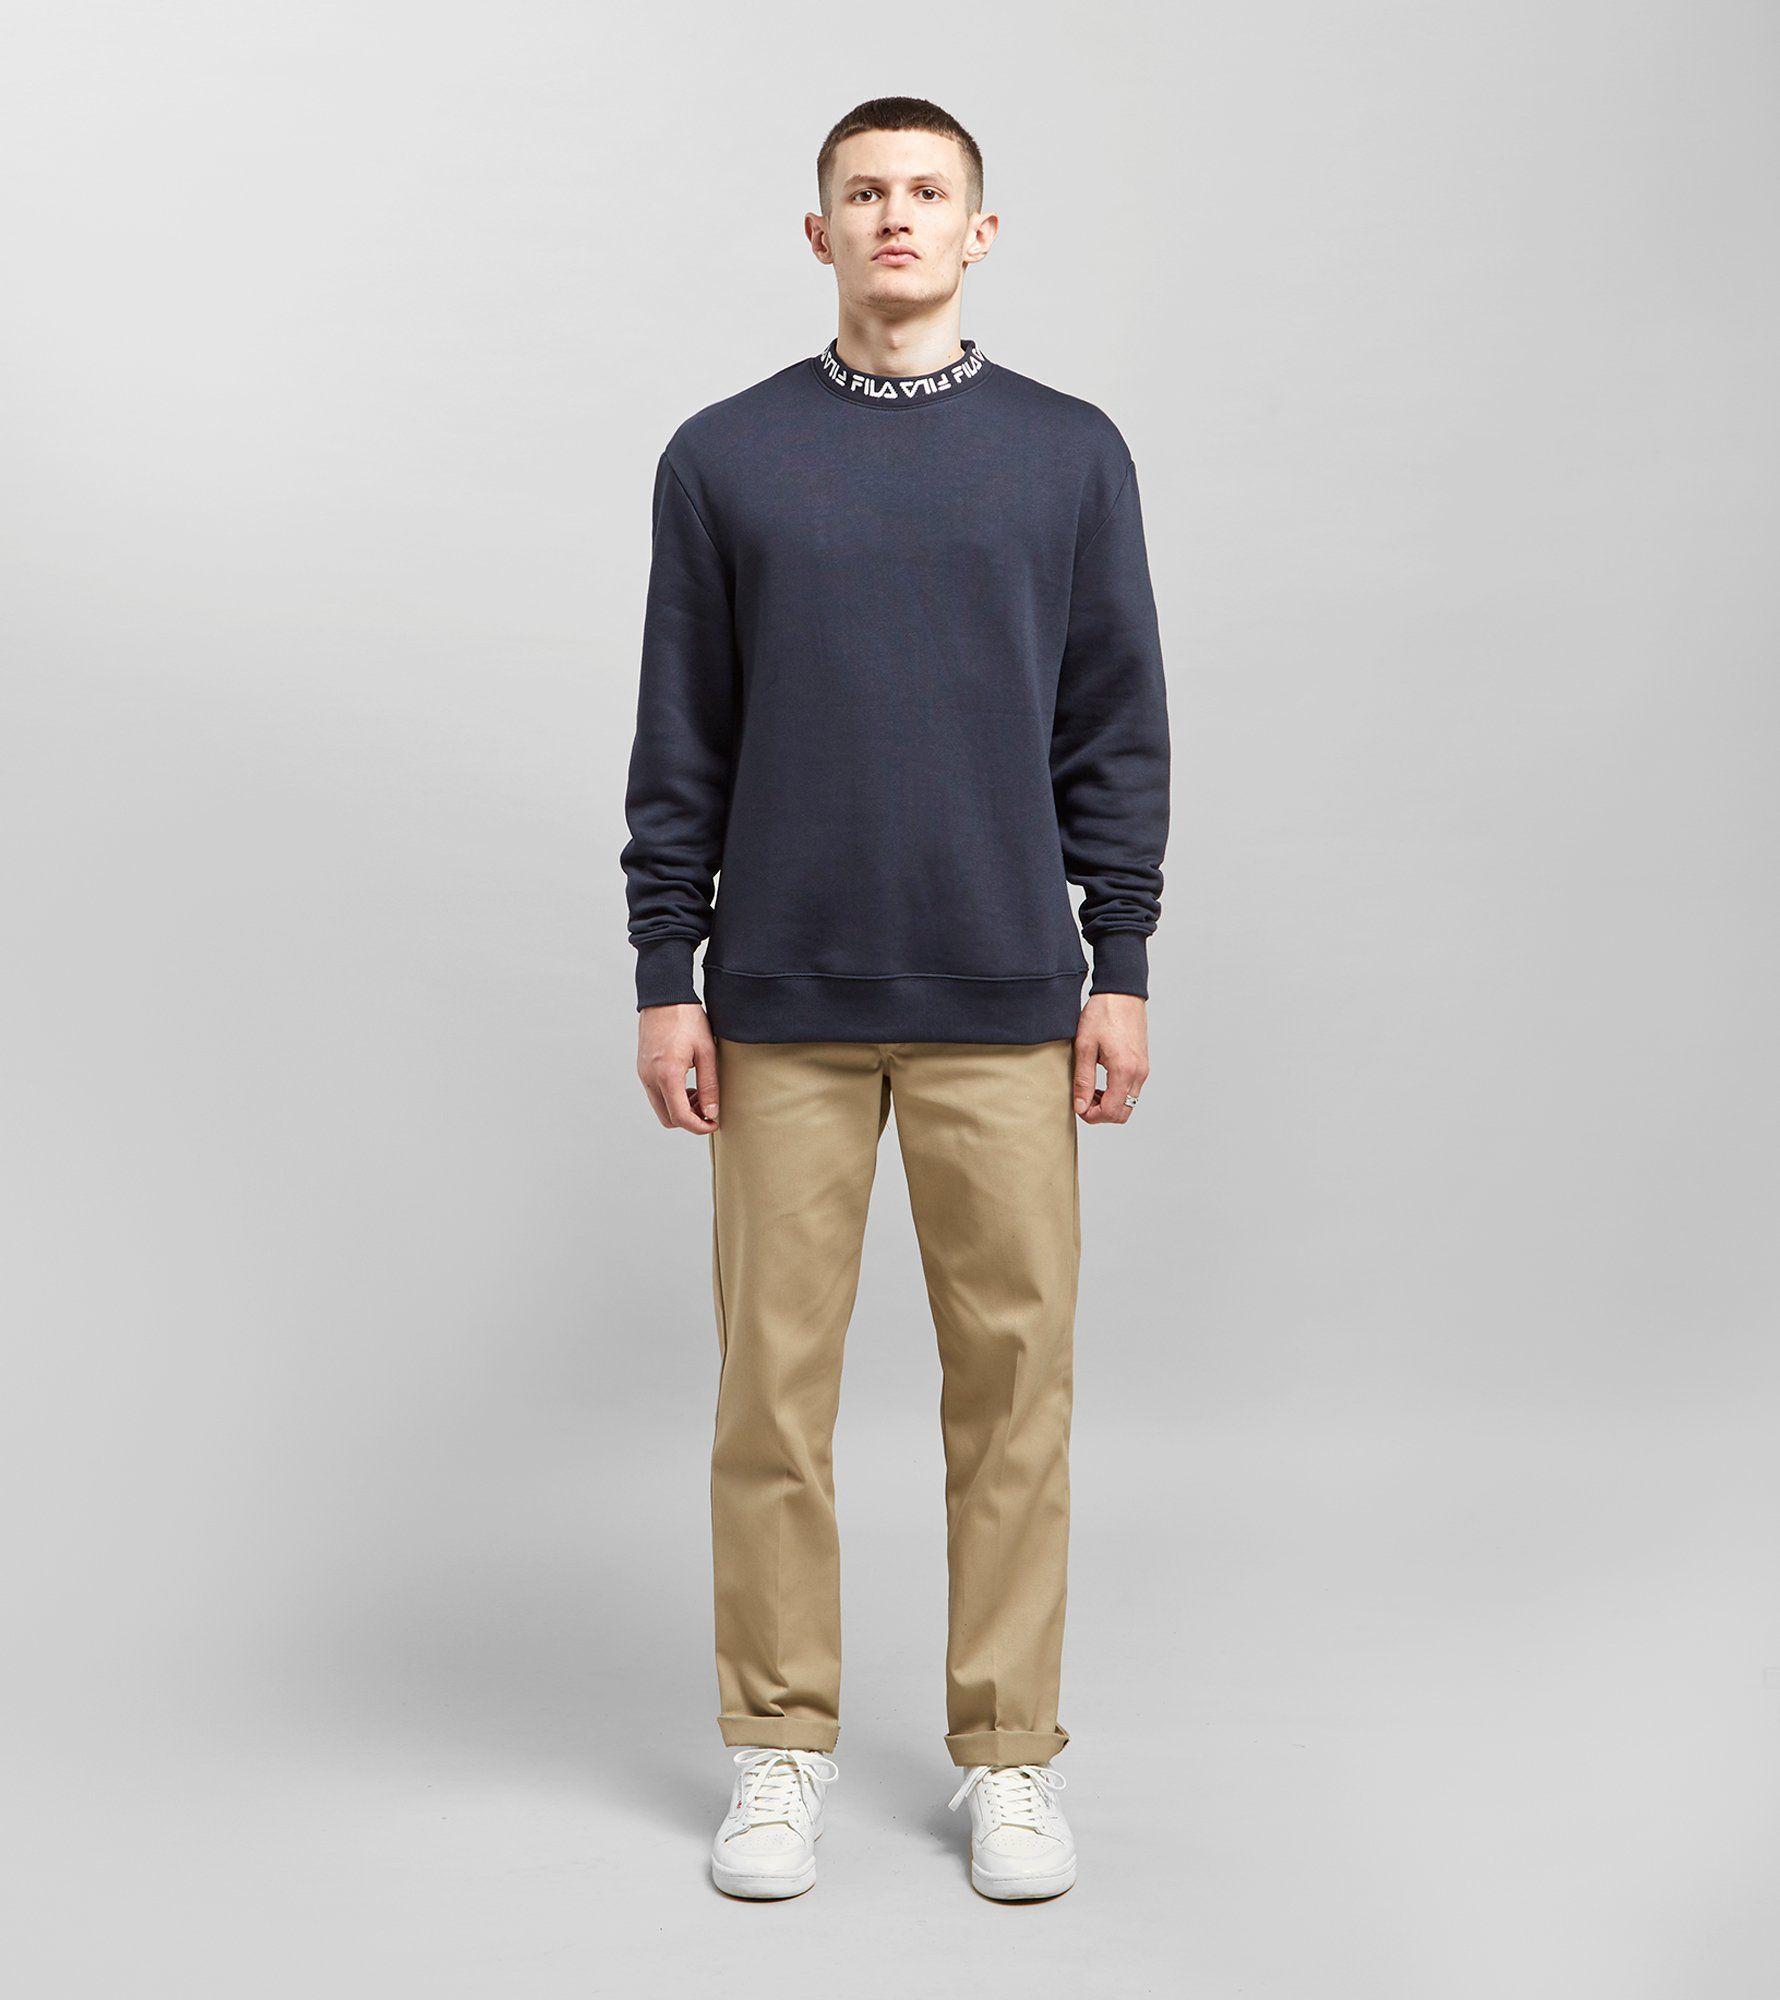 Fila Latemar Crew Sweatshirt